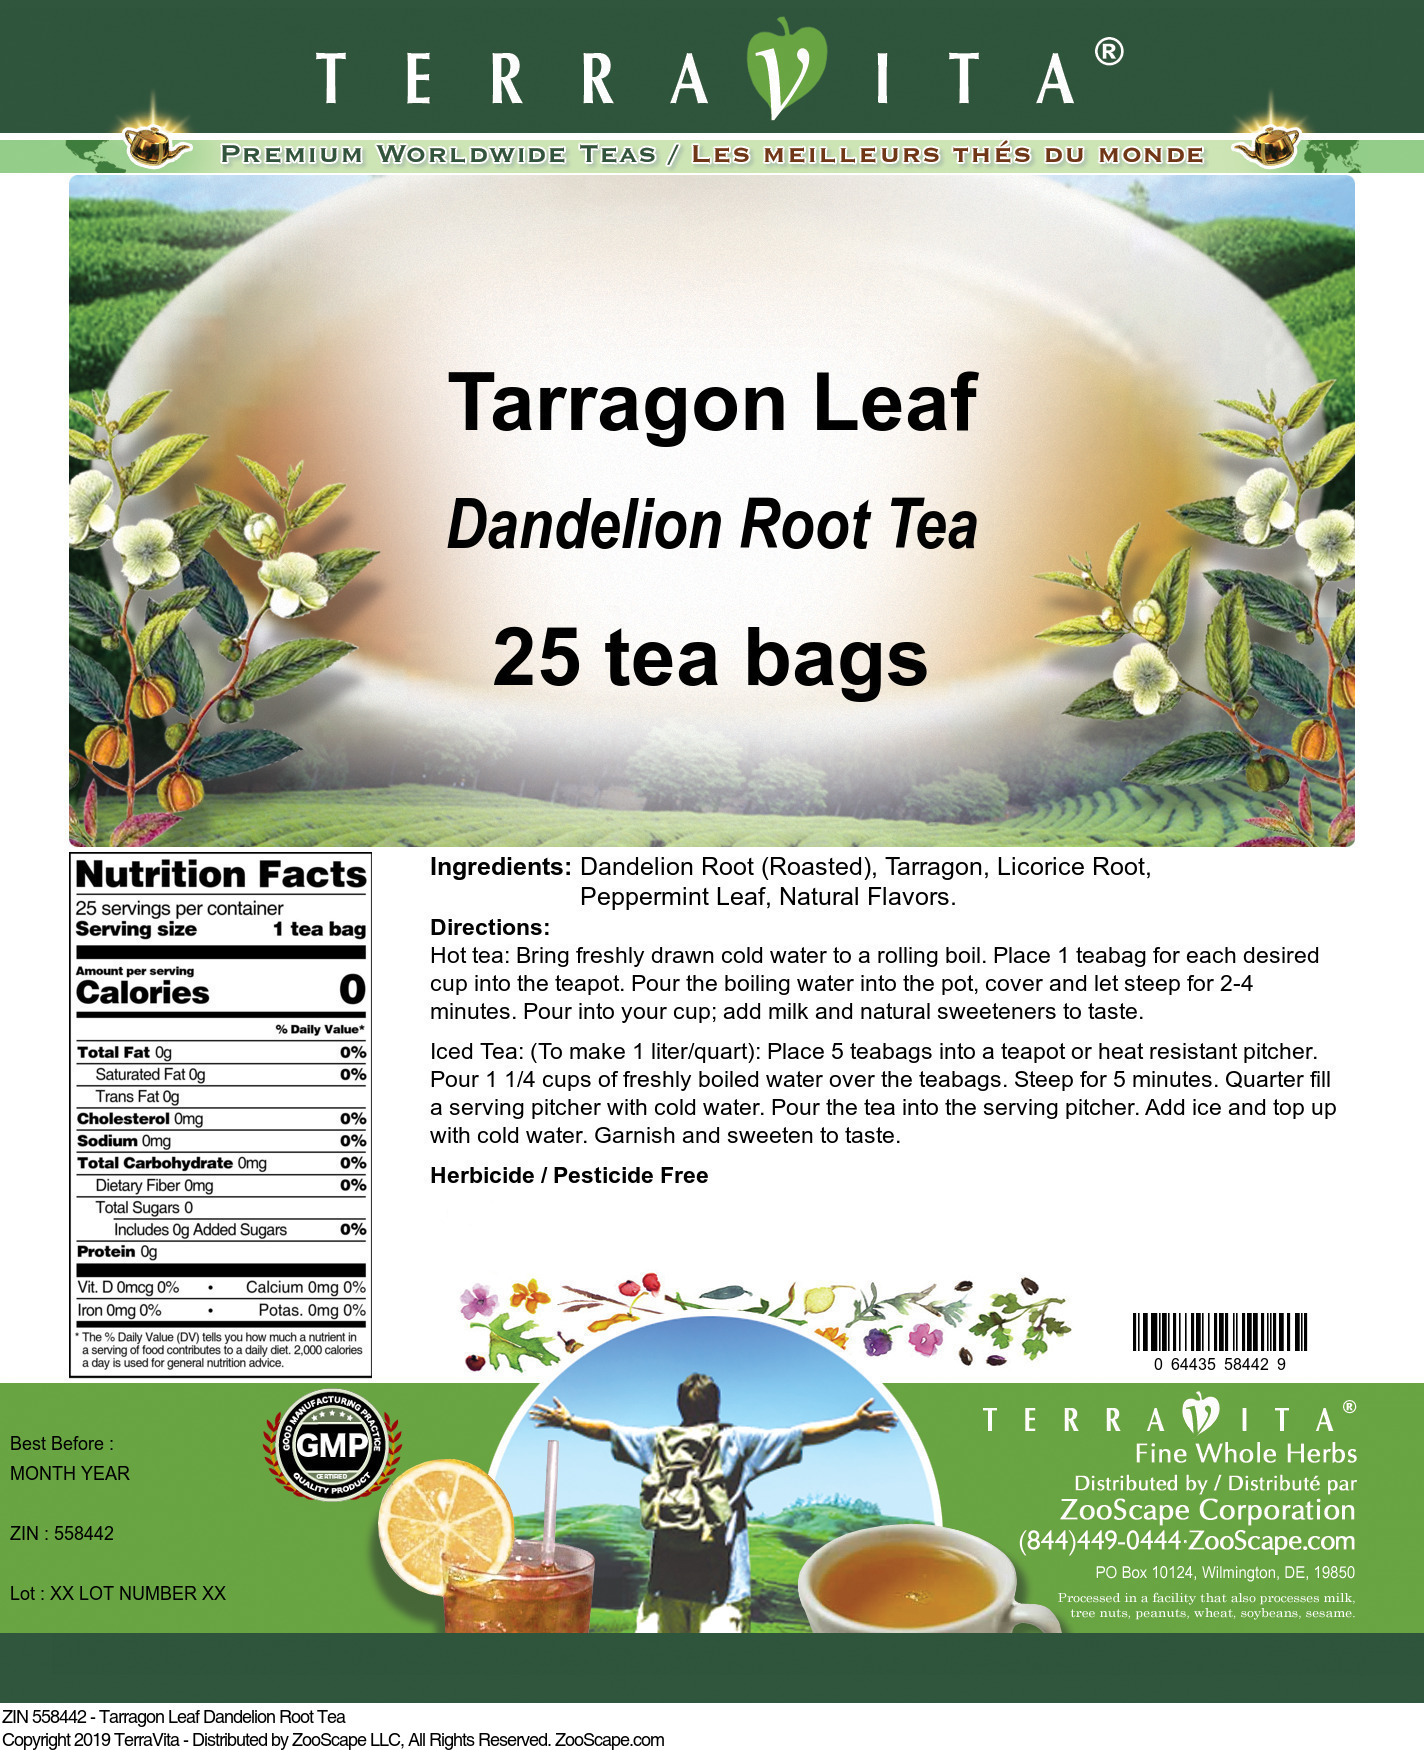 Tarragon Leaf Dandelion Root Tea